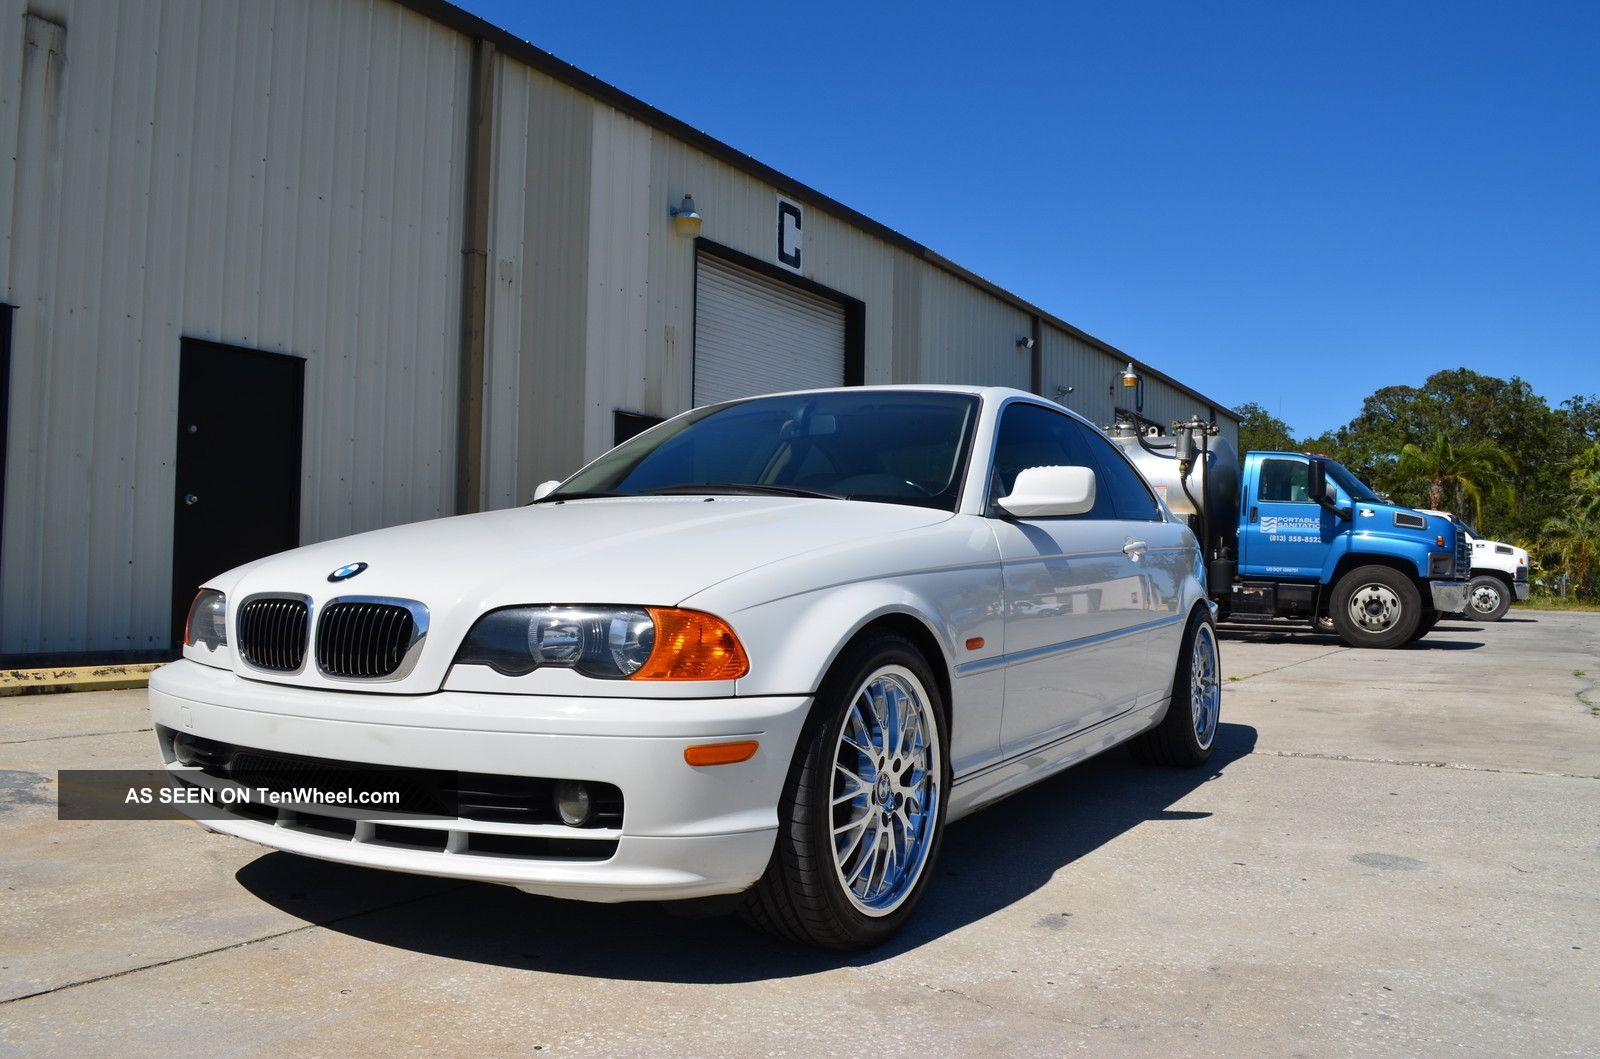 2002 Bmw 325ci Coupe 3-Series photo